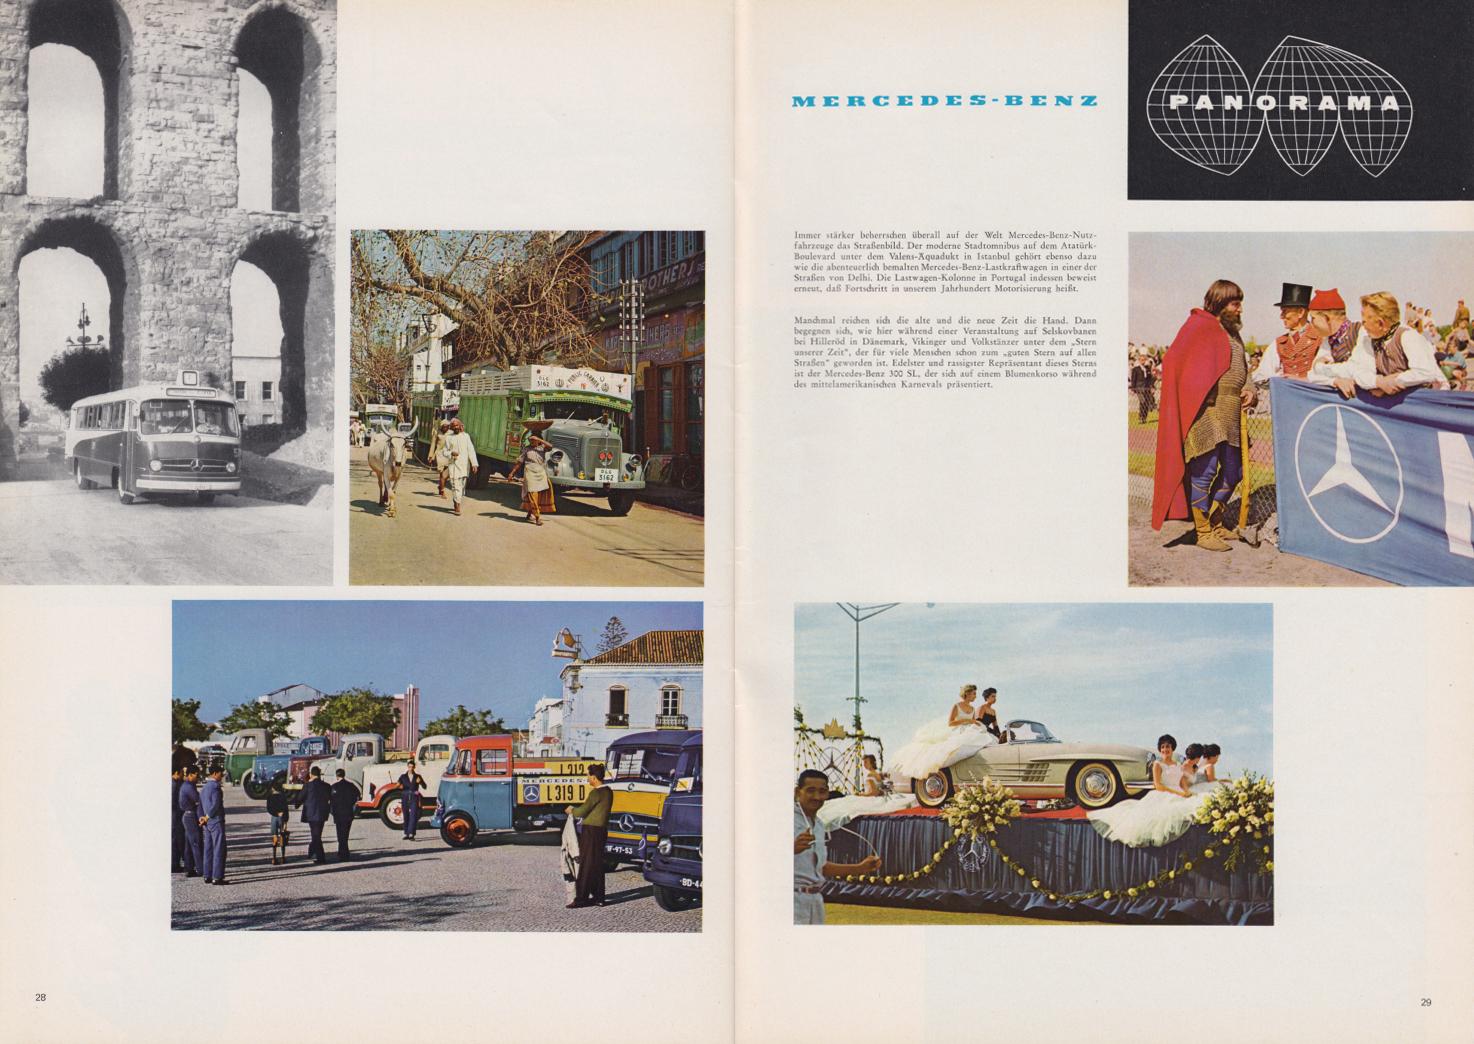 (REVISTA): Periódico In aller welt n.º 44 - Mercedes-Benz no mundo - 1960 - multilingue 015